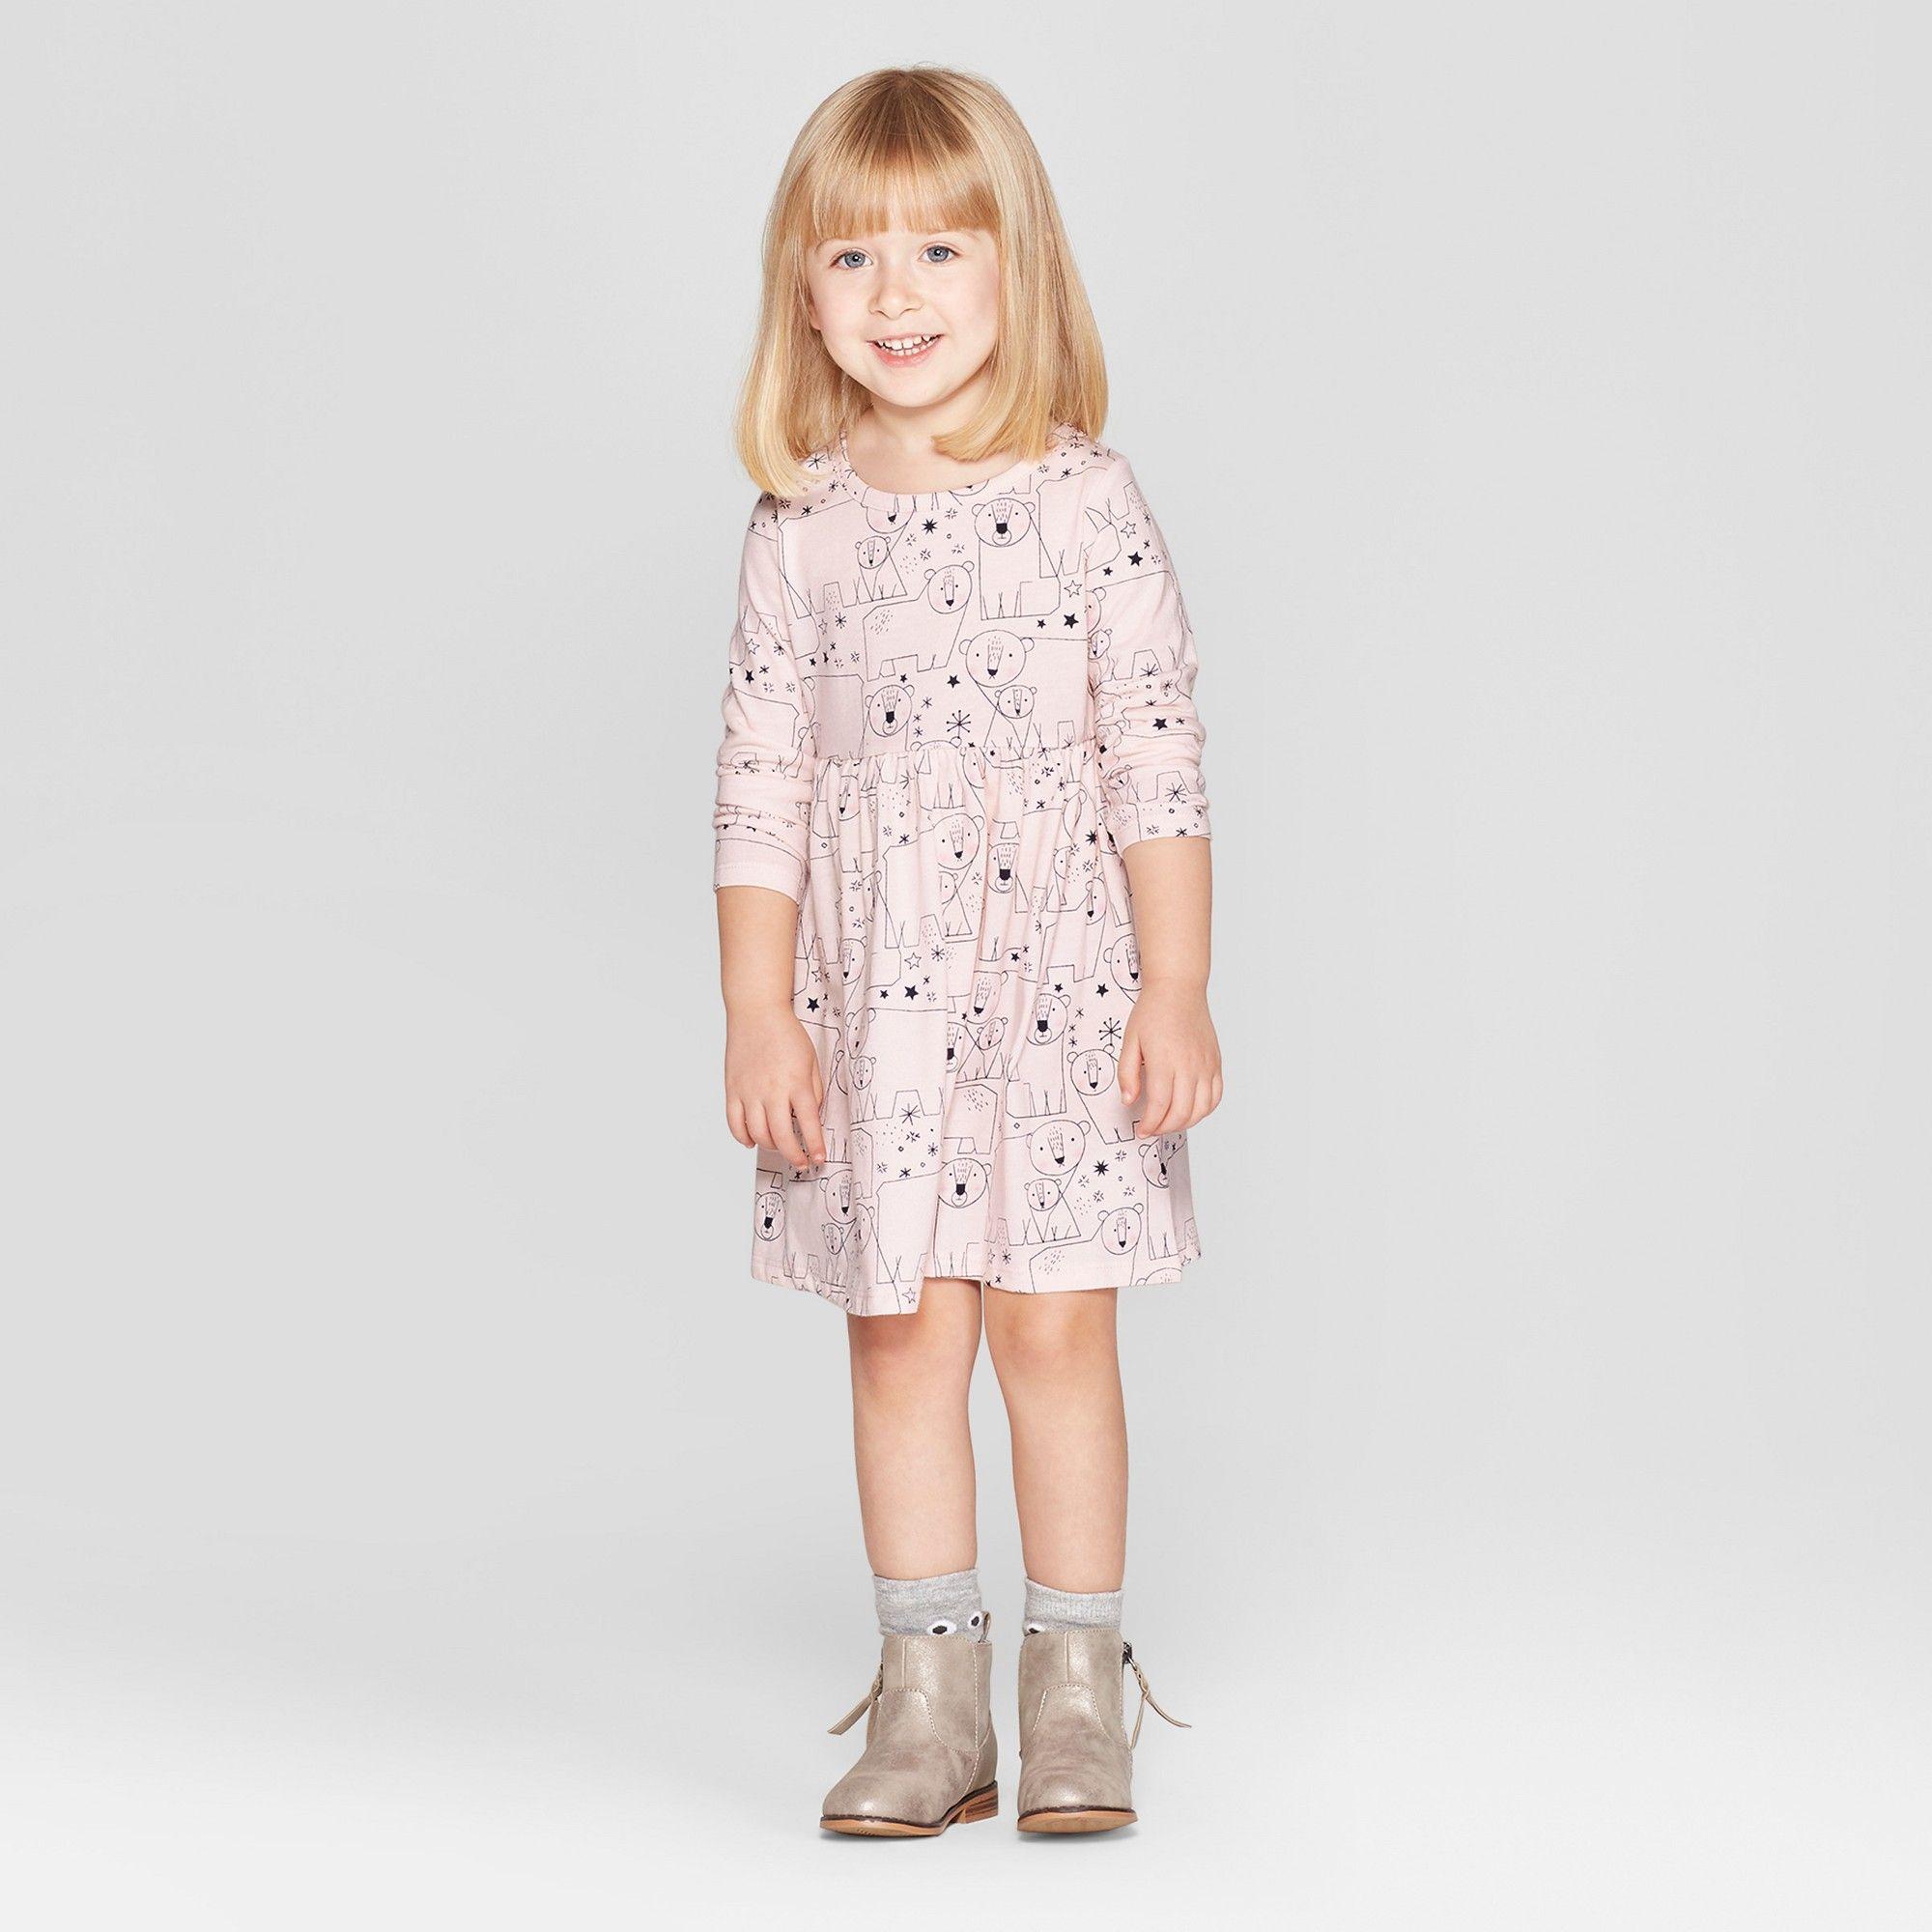 fc034ee2587 Toddler Girls  Bear All Over Print A-Line Dress - Cat   Jack Pink ...